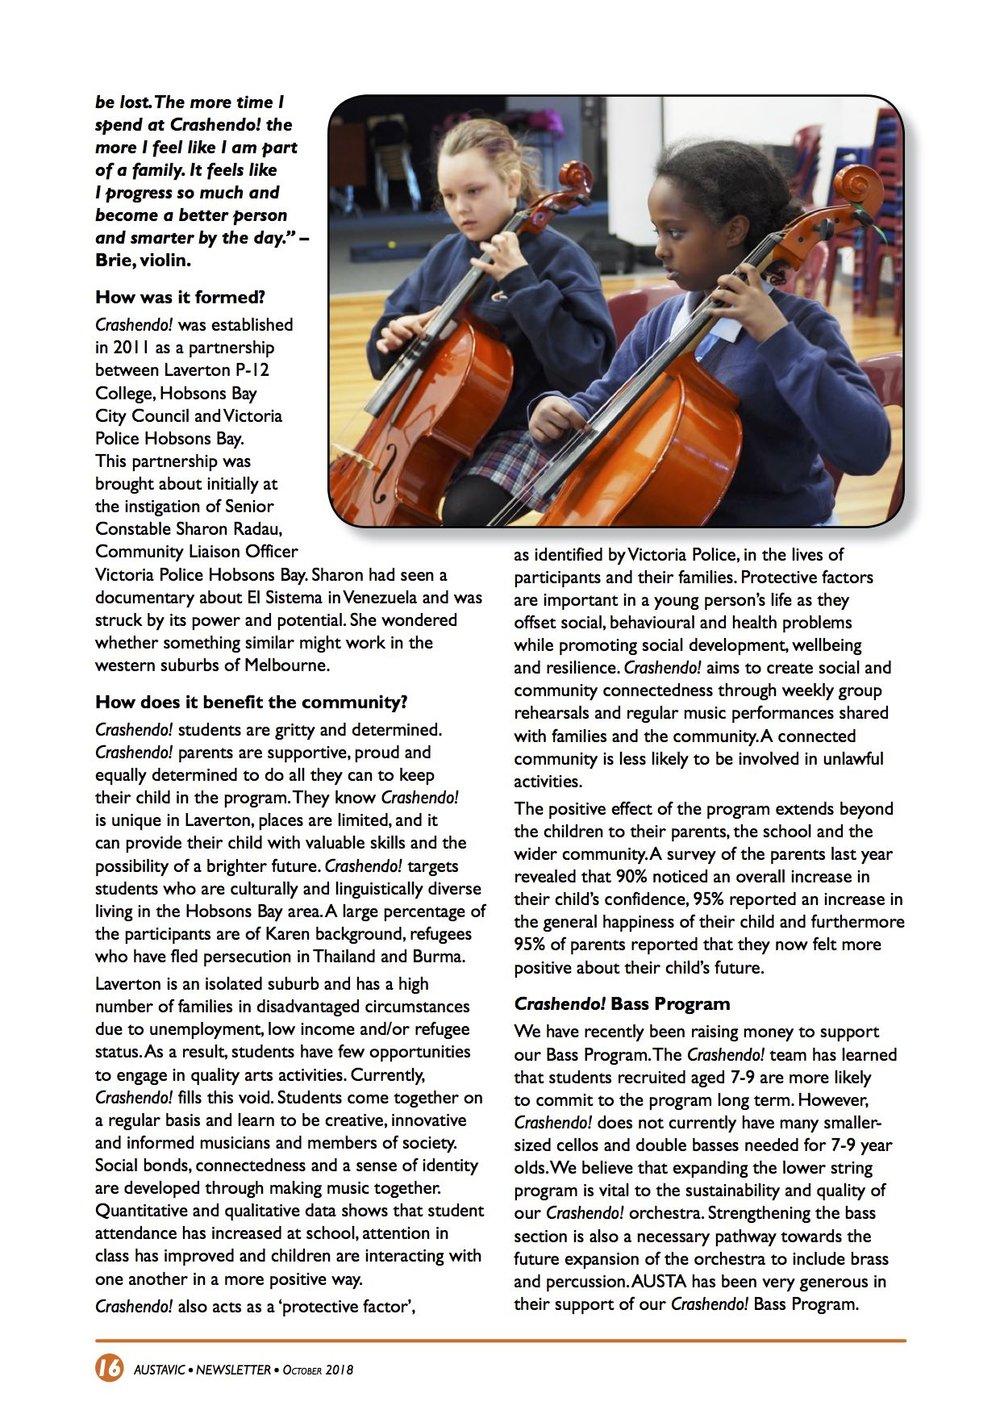 AUSTA article_Crashendop.2.jpg